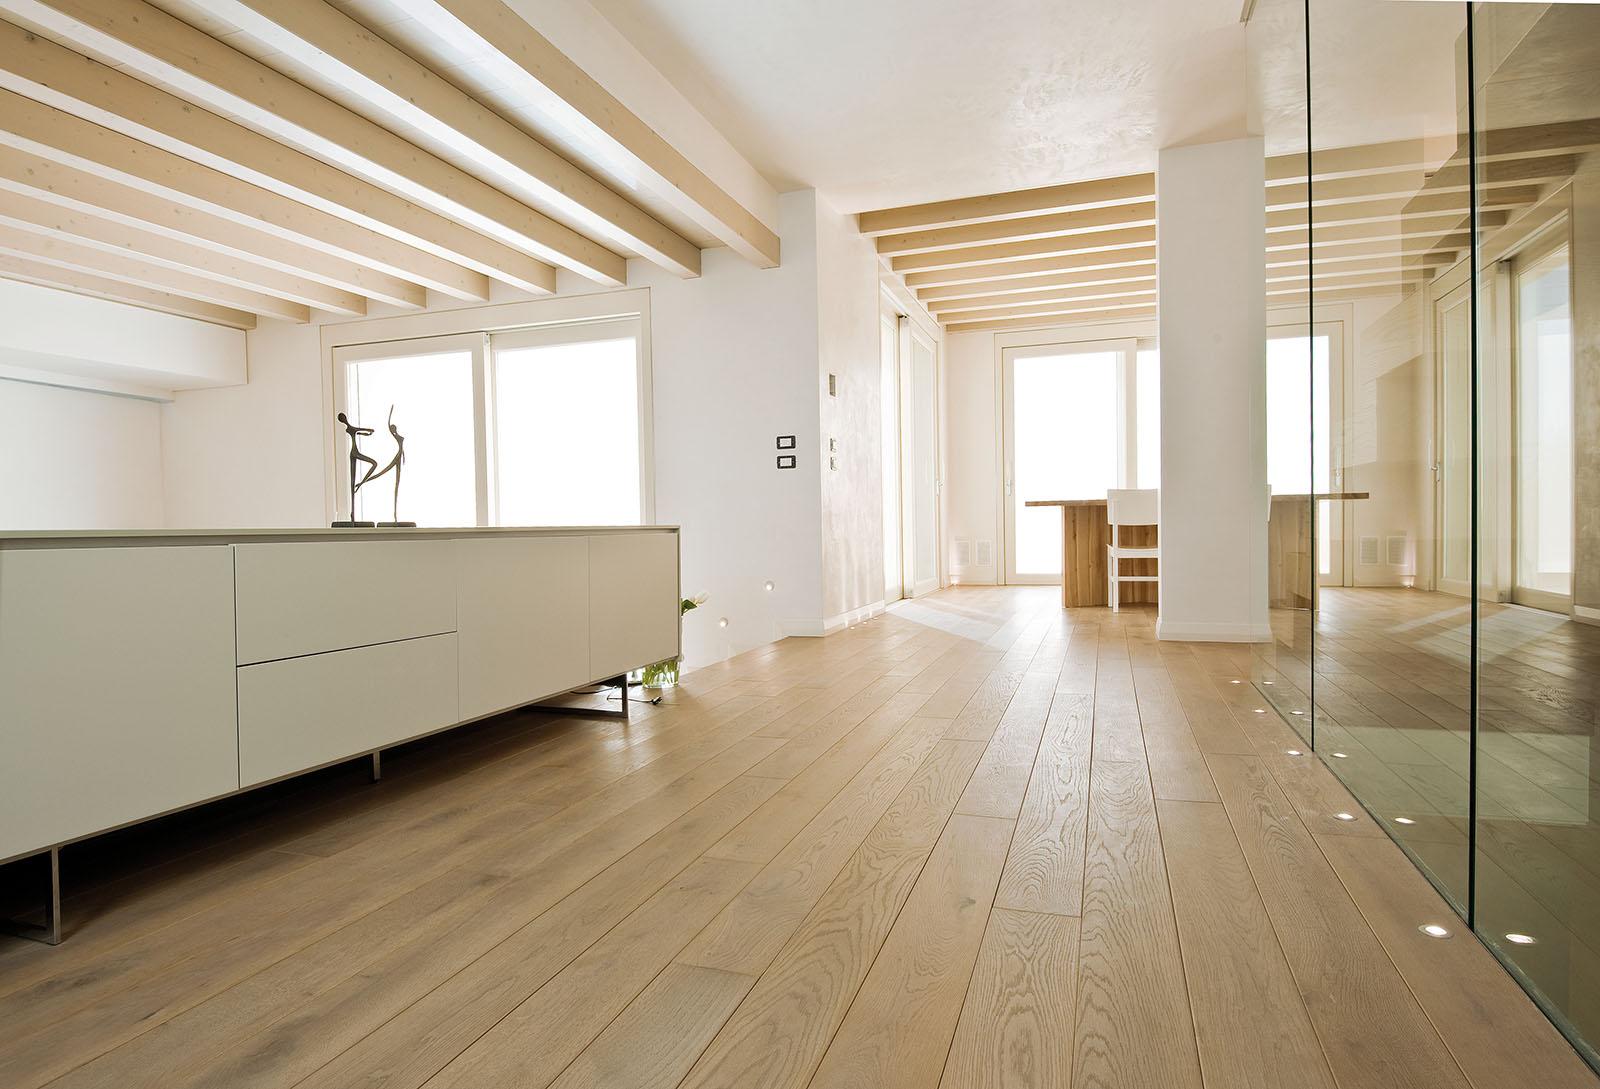 Pavimenti flottanti per interni prezzi pavimenti marazzi - Pavimento flottante per esterni prezzi ...